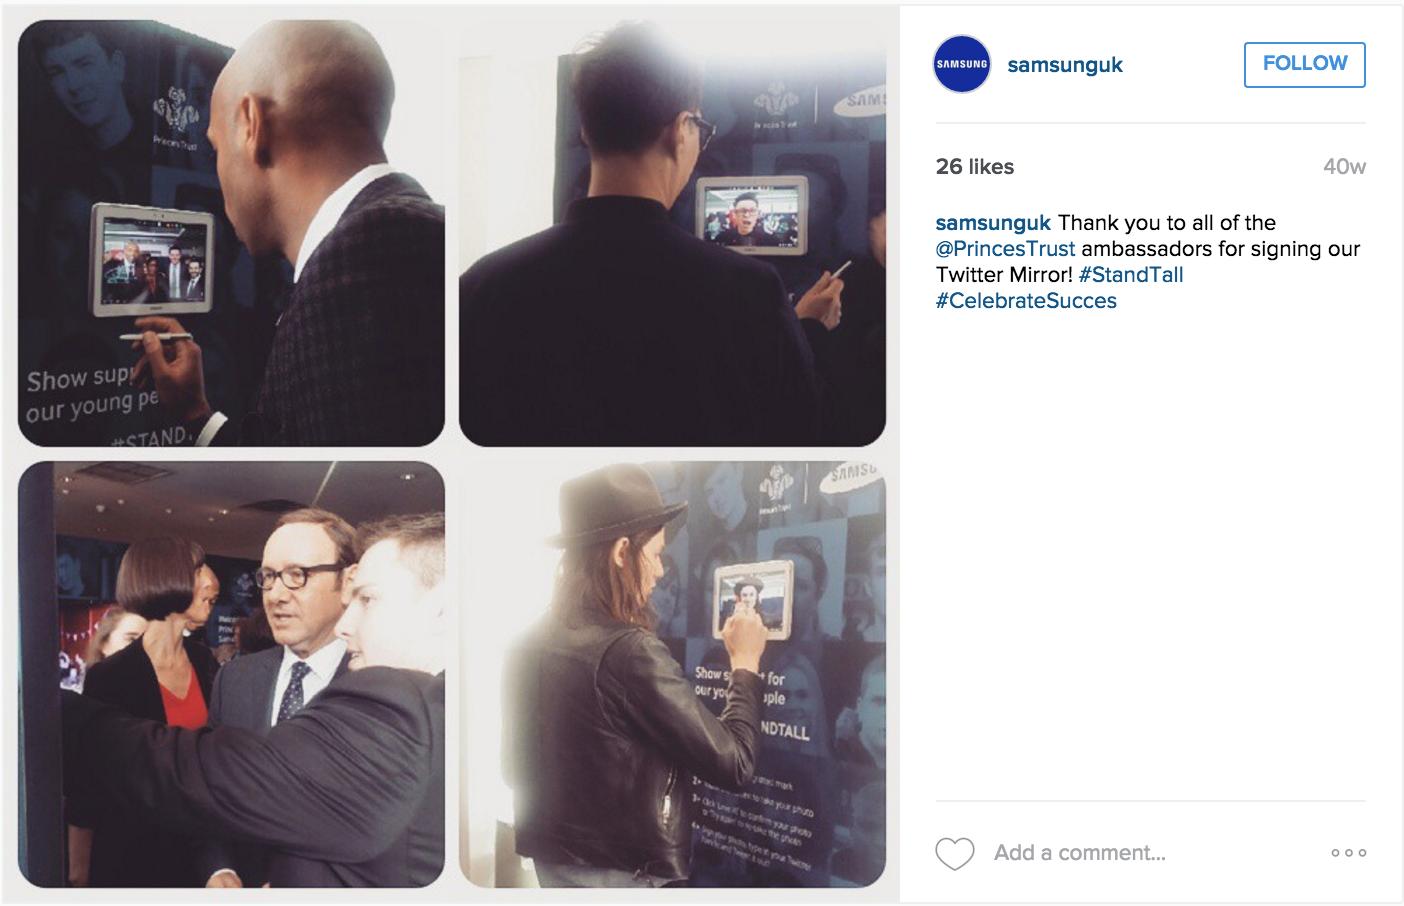 Samsung UK - Instagram Campaign